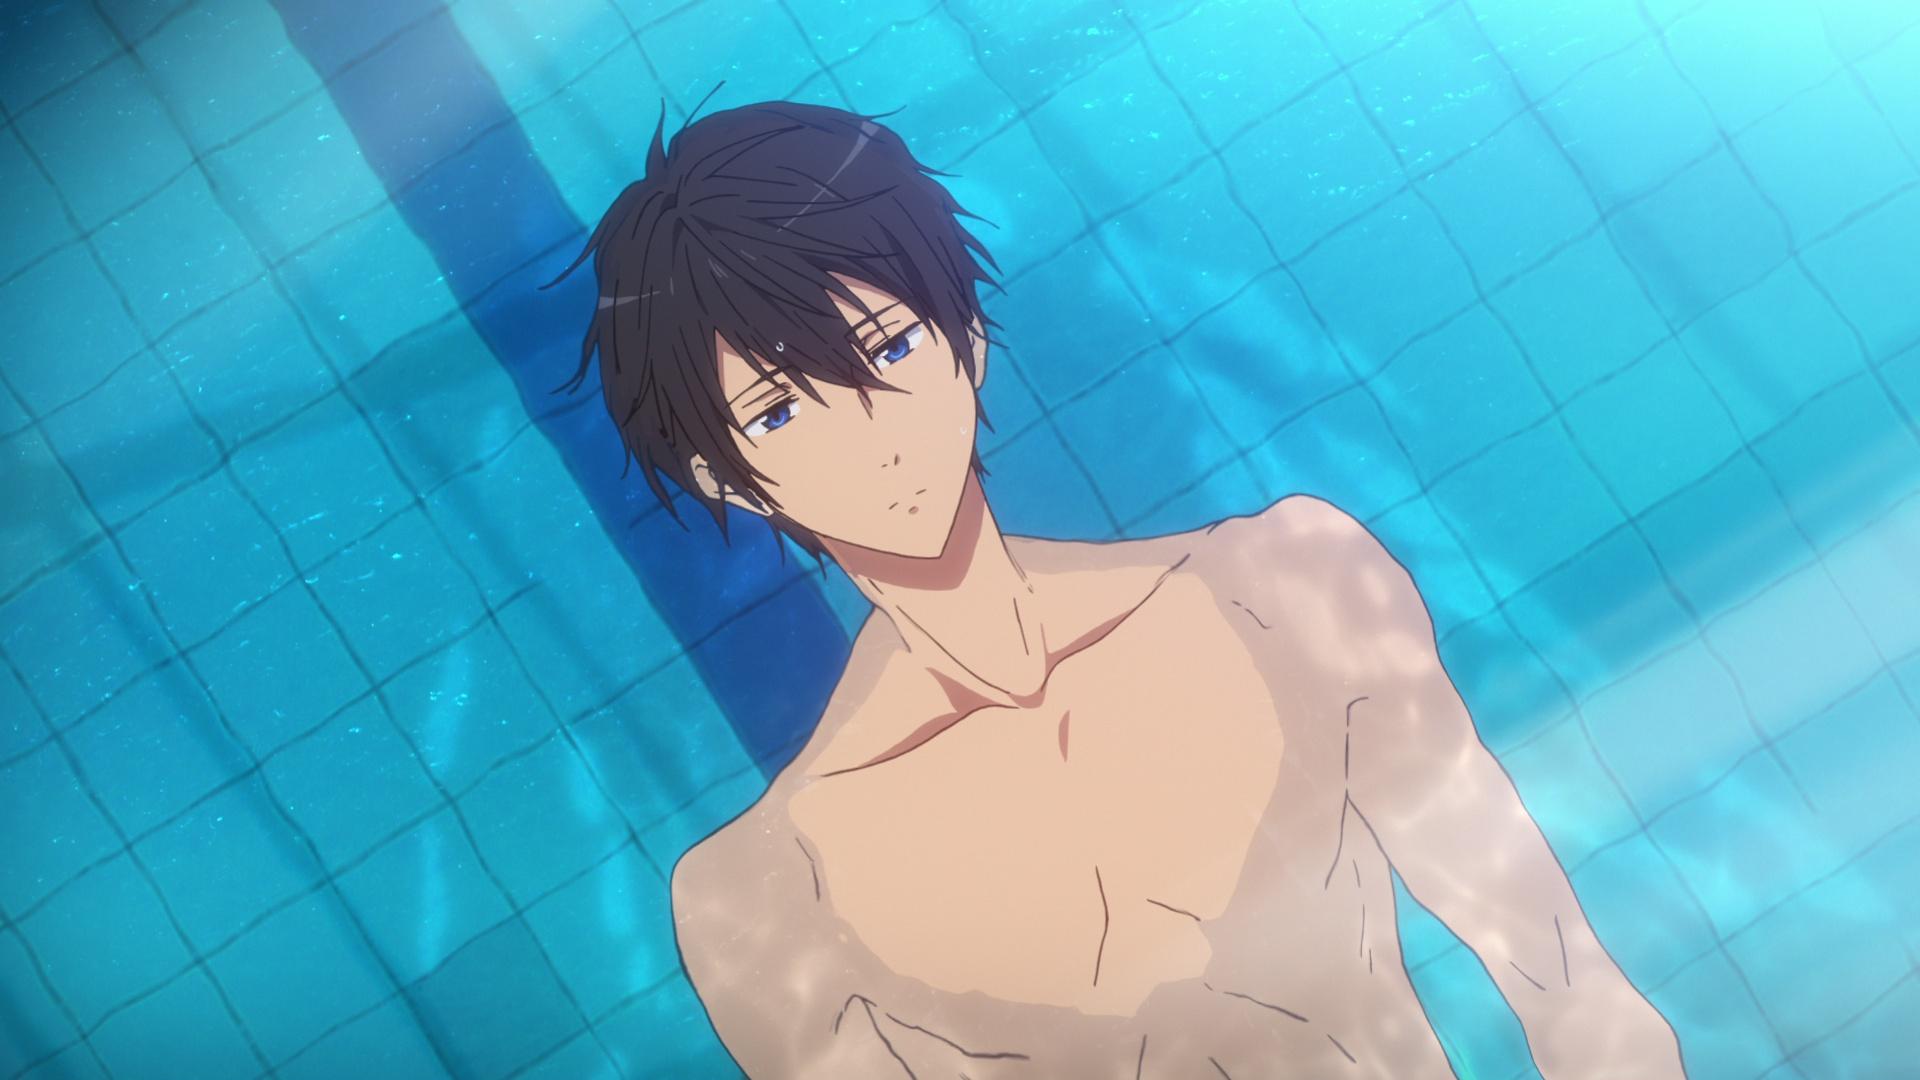 Watch Free! Season 3 Episode 1 Sub & Dub   Anime Uncut